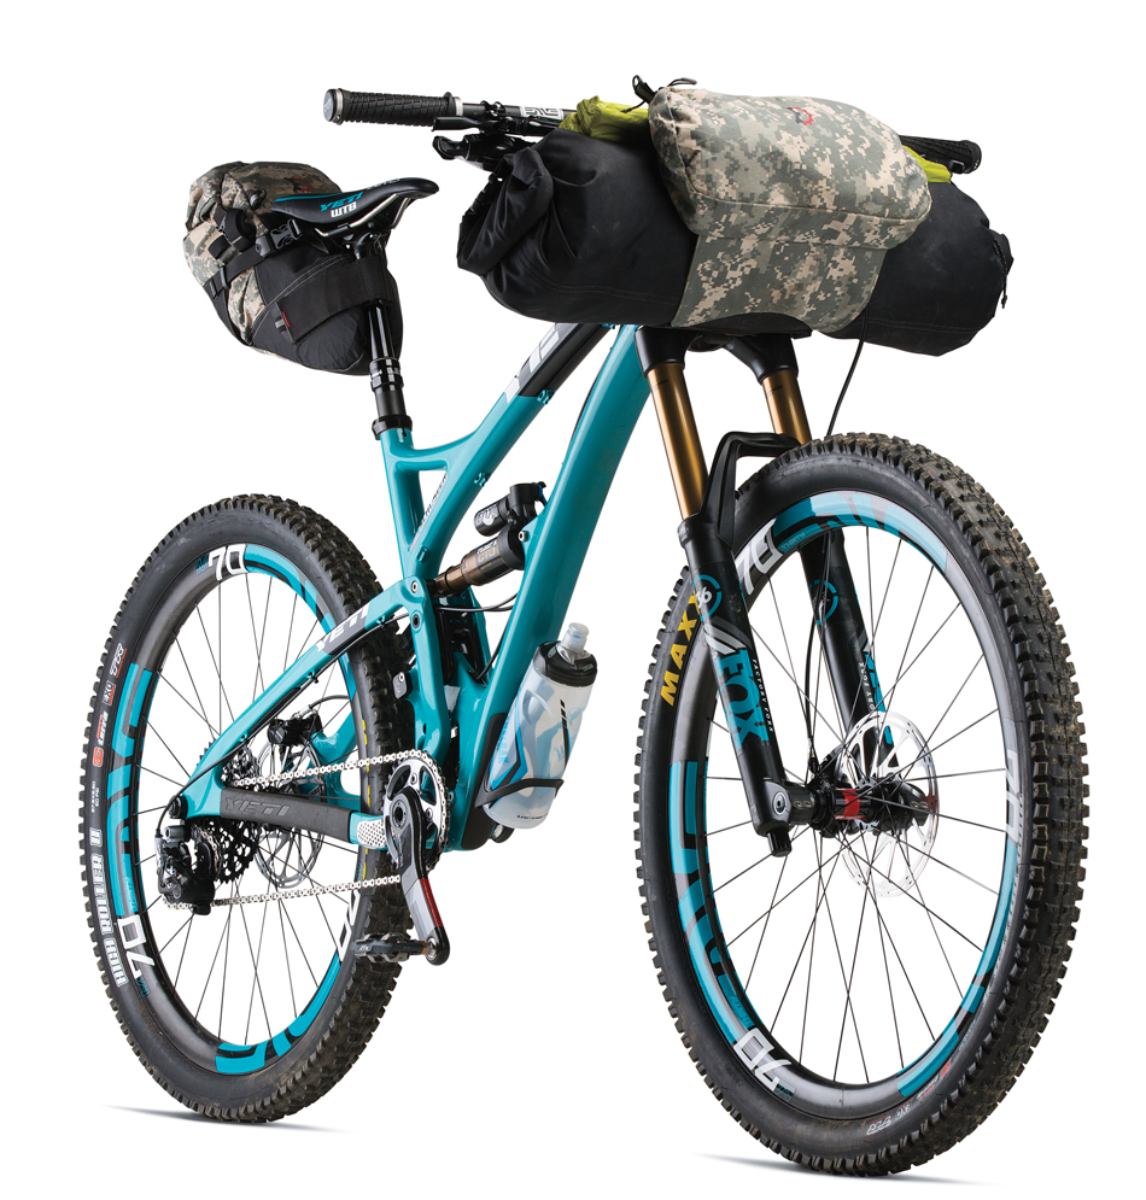 Joey Schusler's Bikepacking Setup | BIKE Magazine